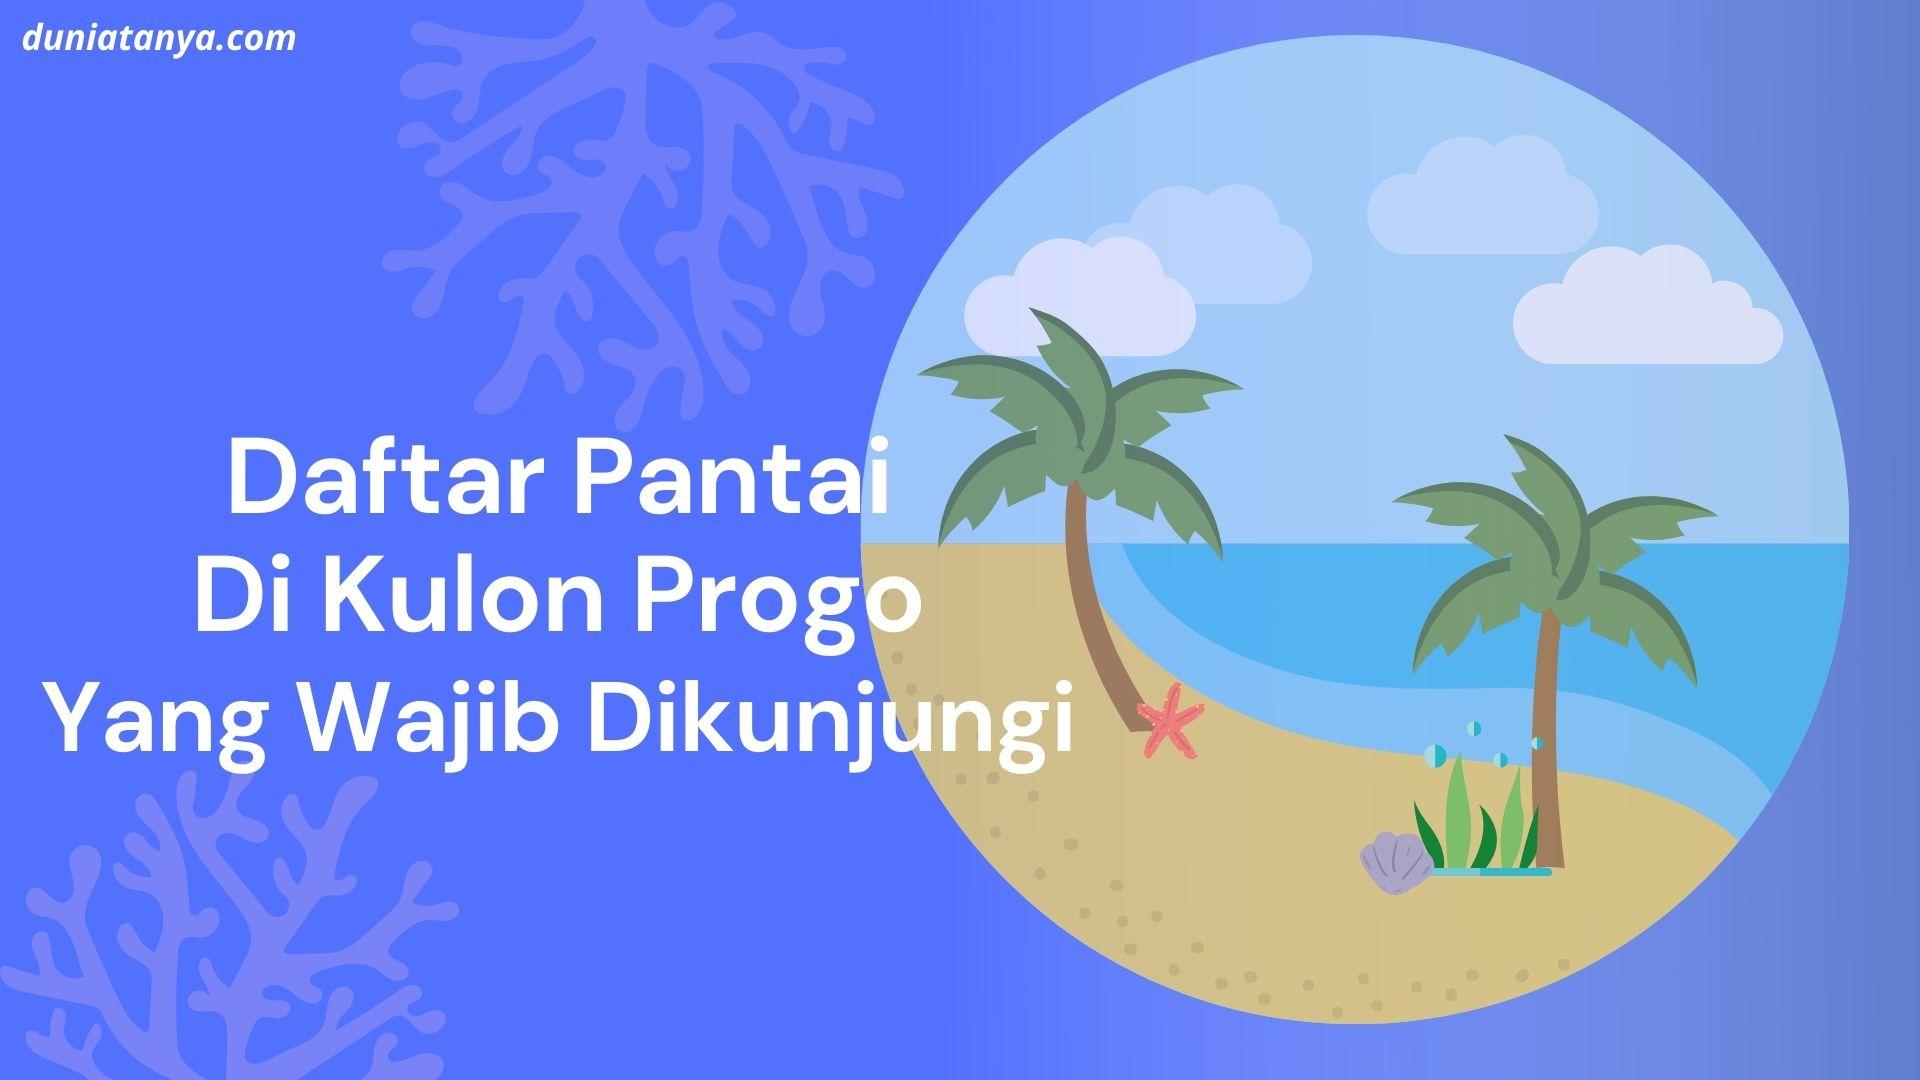 You are currently viewing Daftar Pantai Di Kulon Progo Yang Wajib Dikunjungi